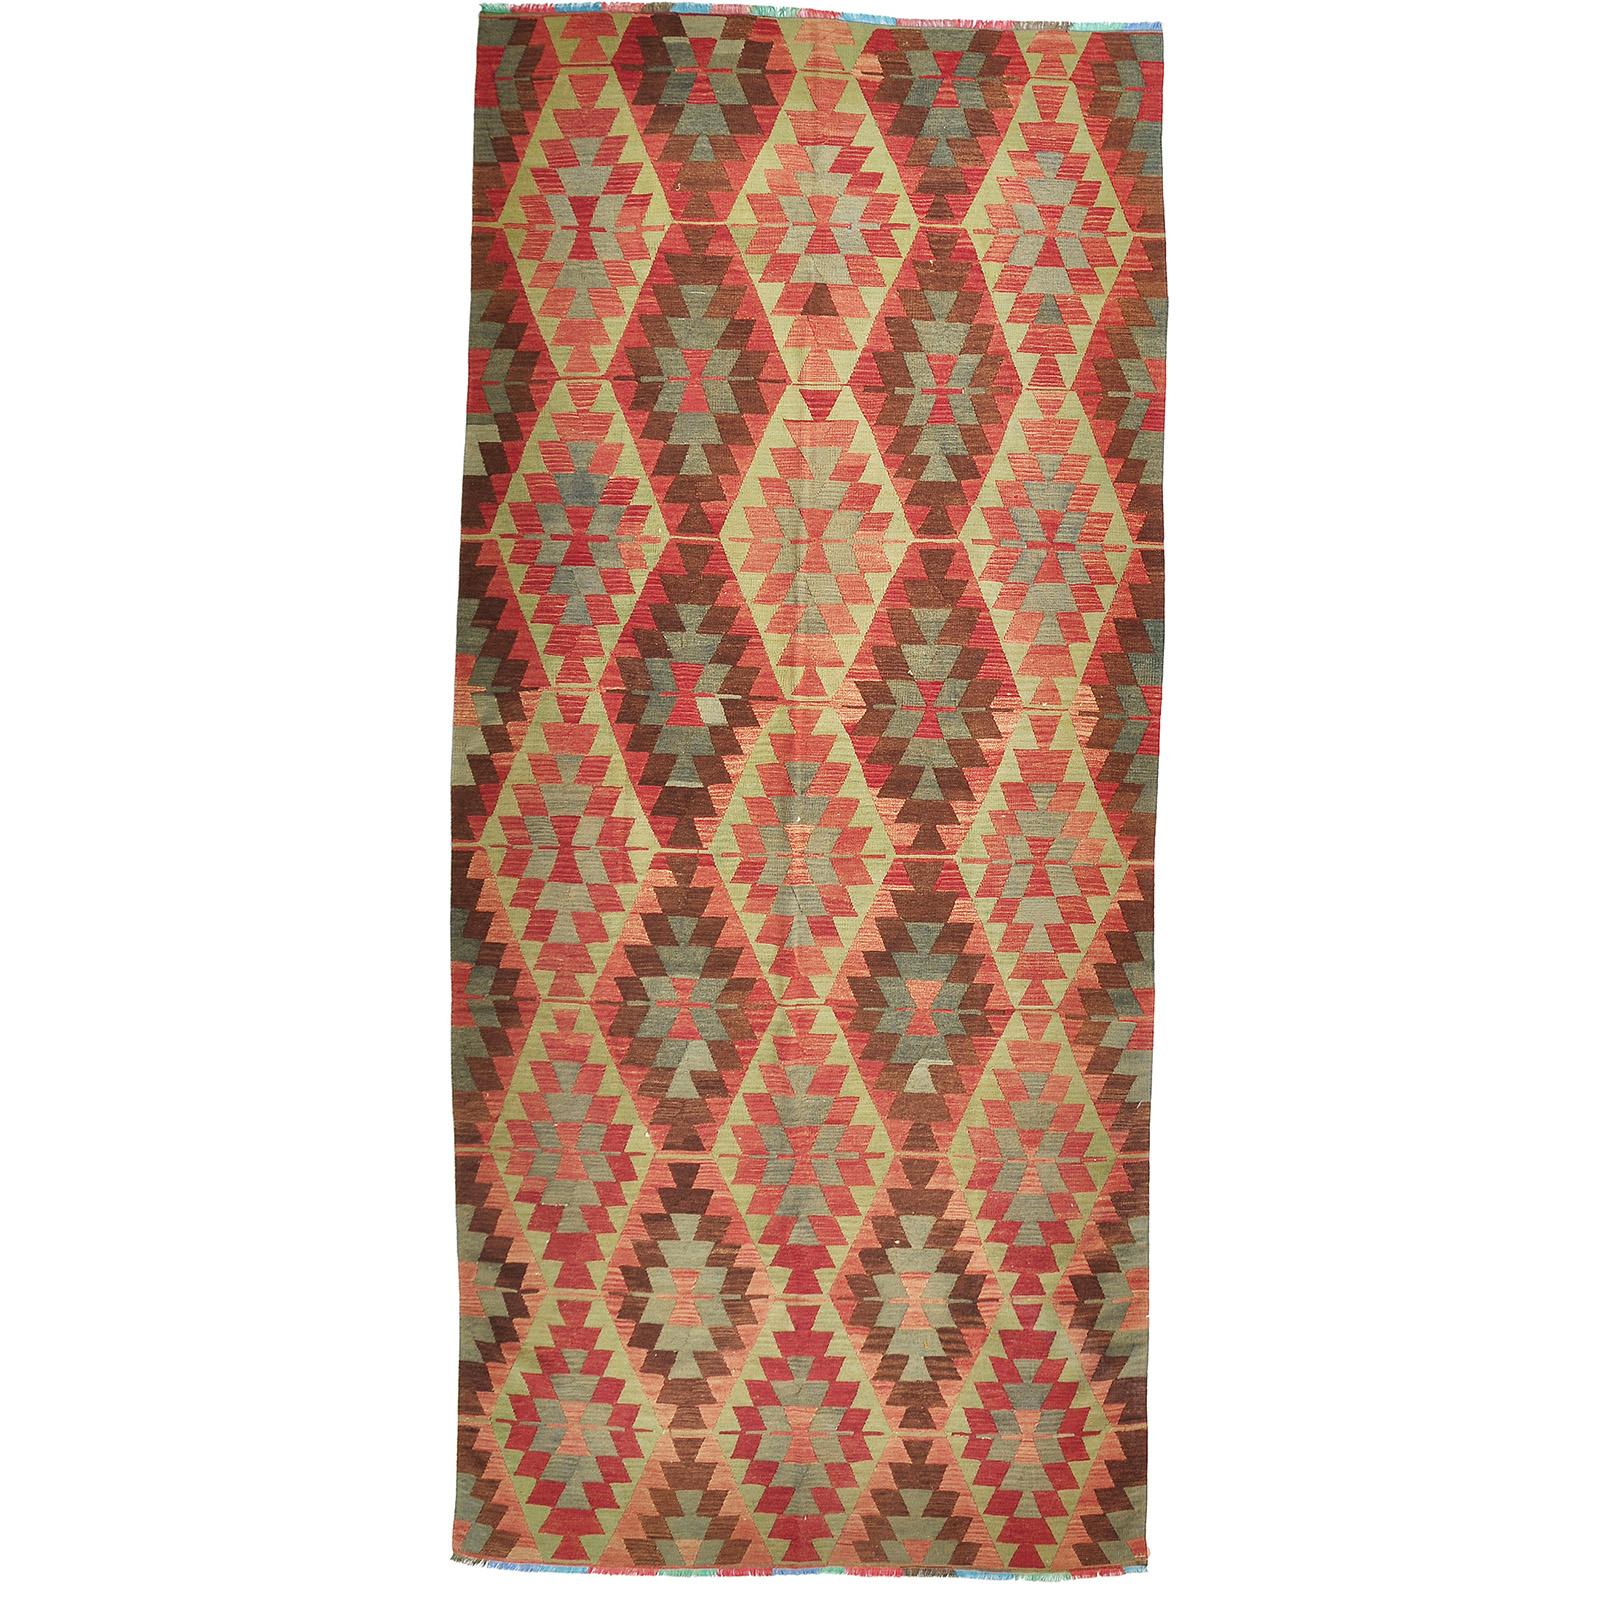 Kelim (old) matta storlek 386x174 cm